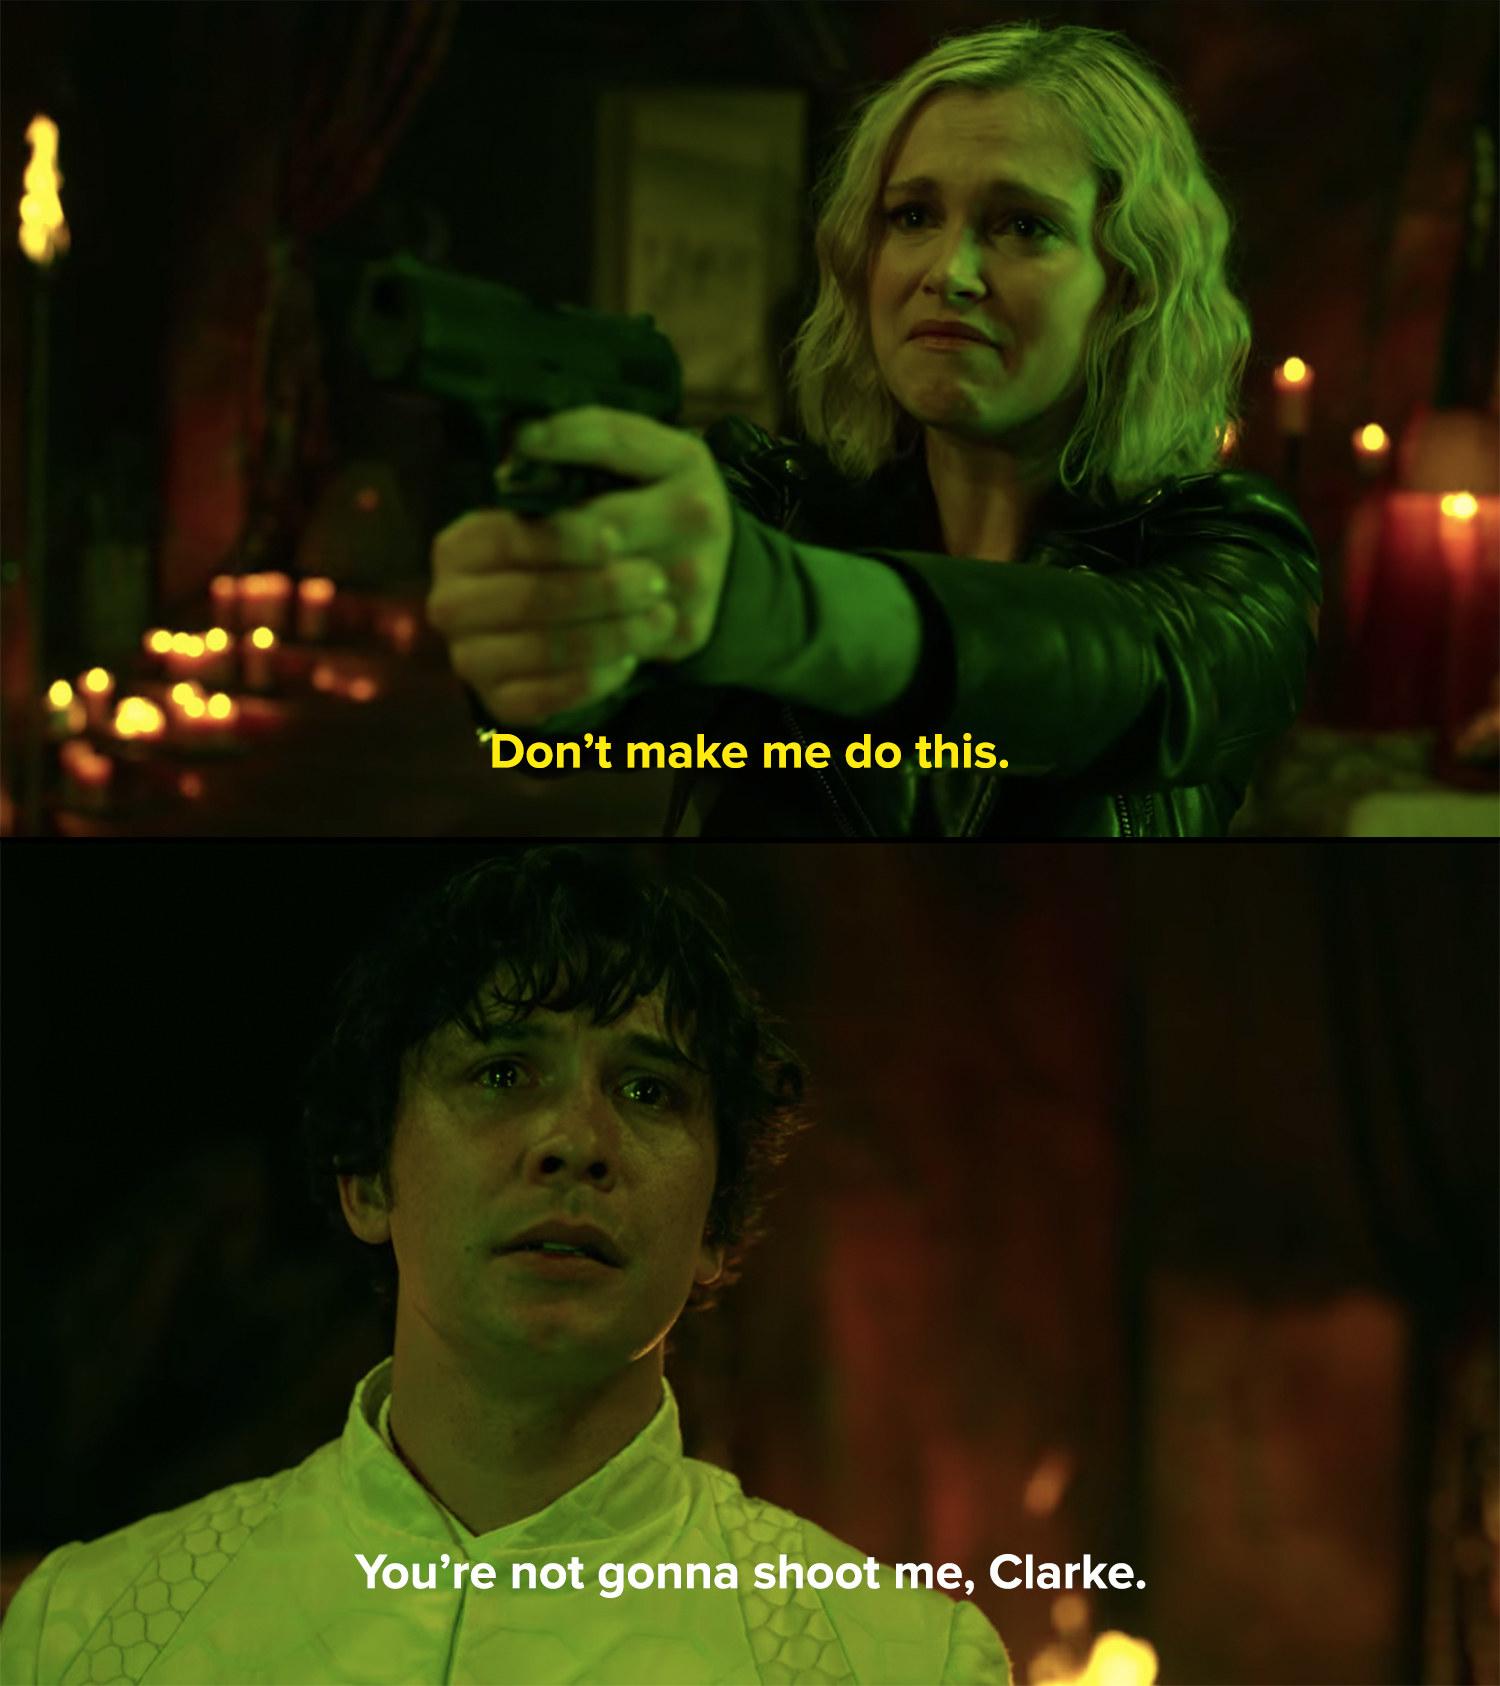 Bellamy tells Clarke she won't shoot him even as she holds him at gunpoint